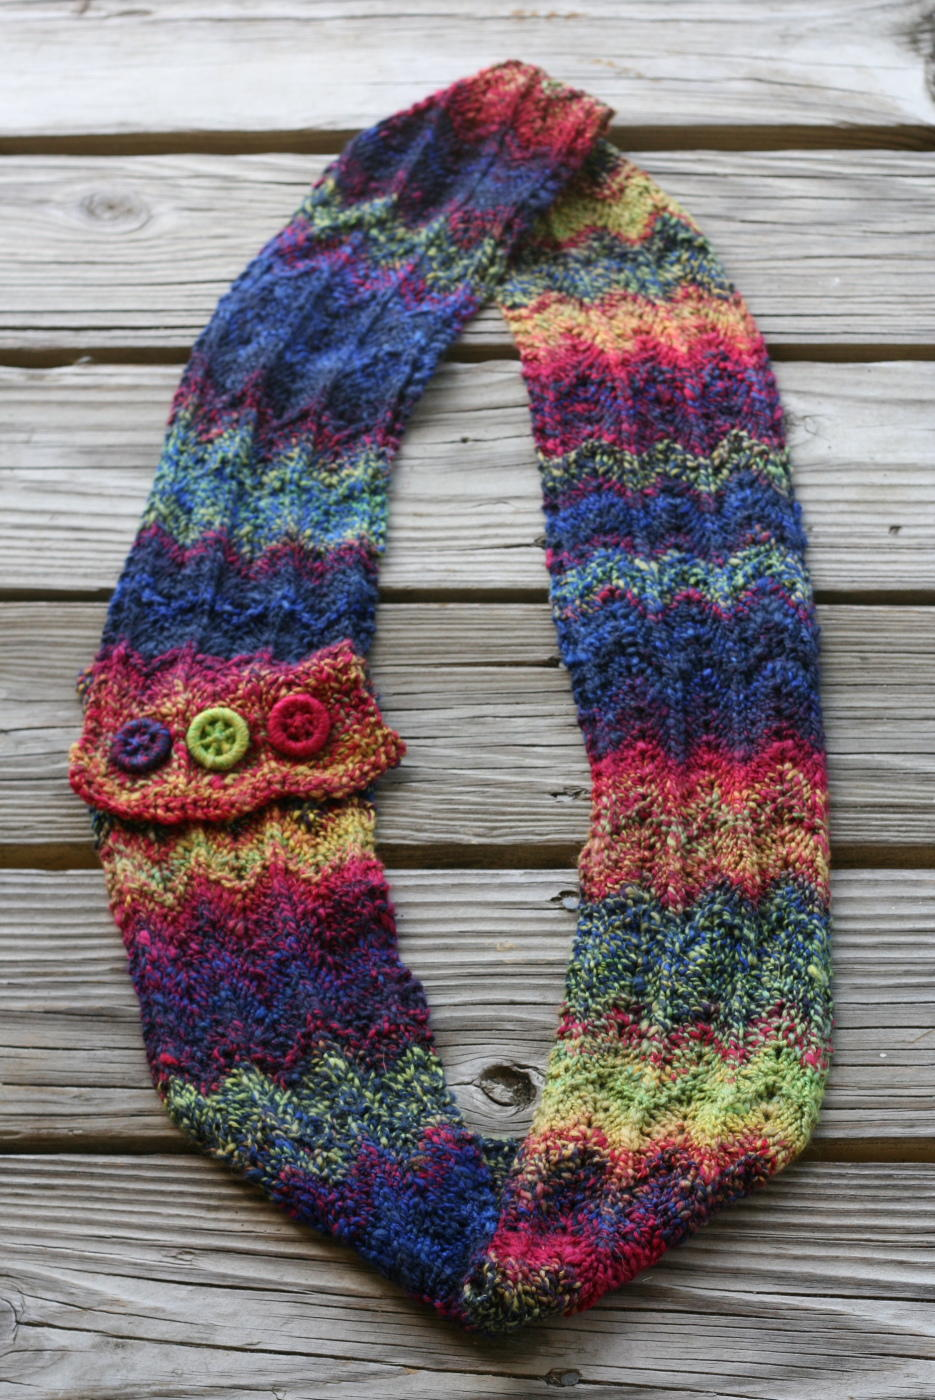 Knitting Different Yarn Weights : Ripplet allfreeknitting